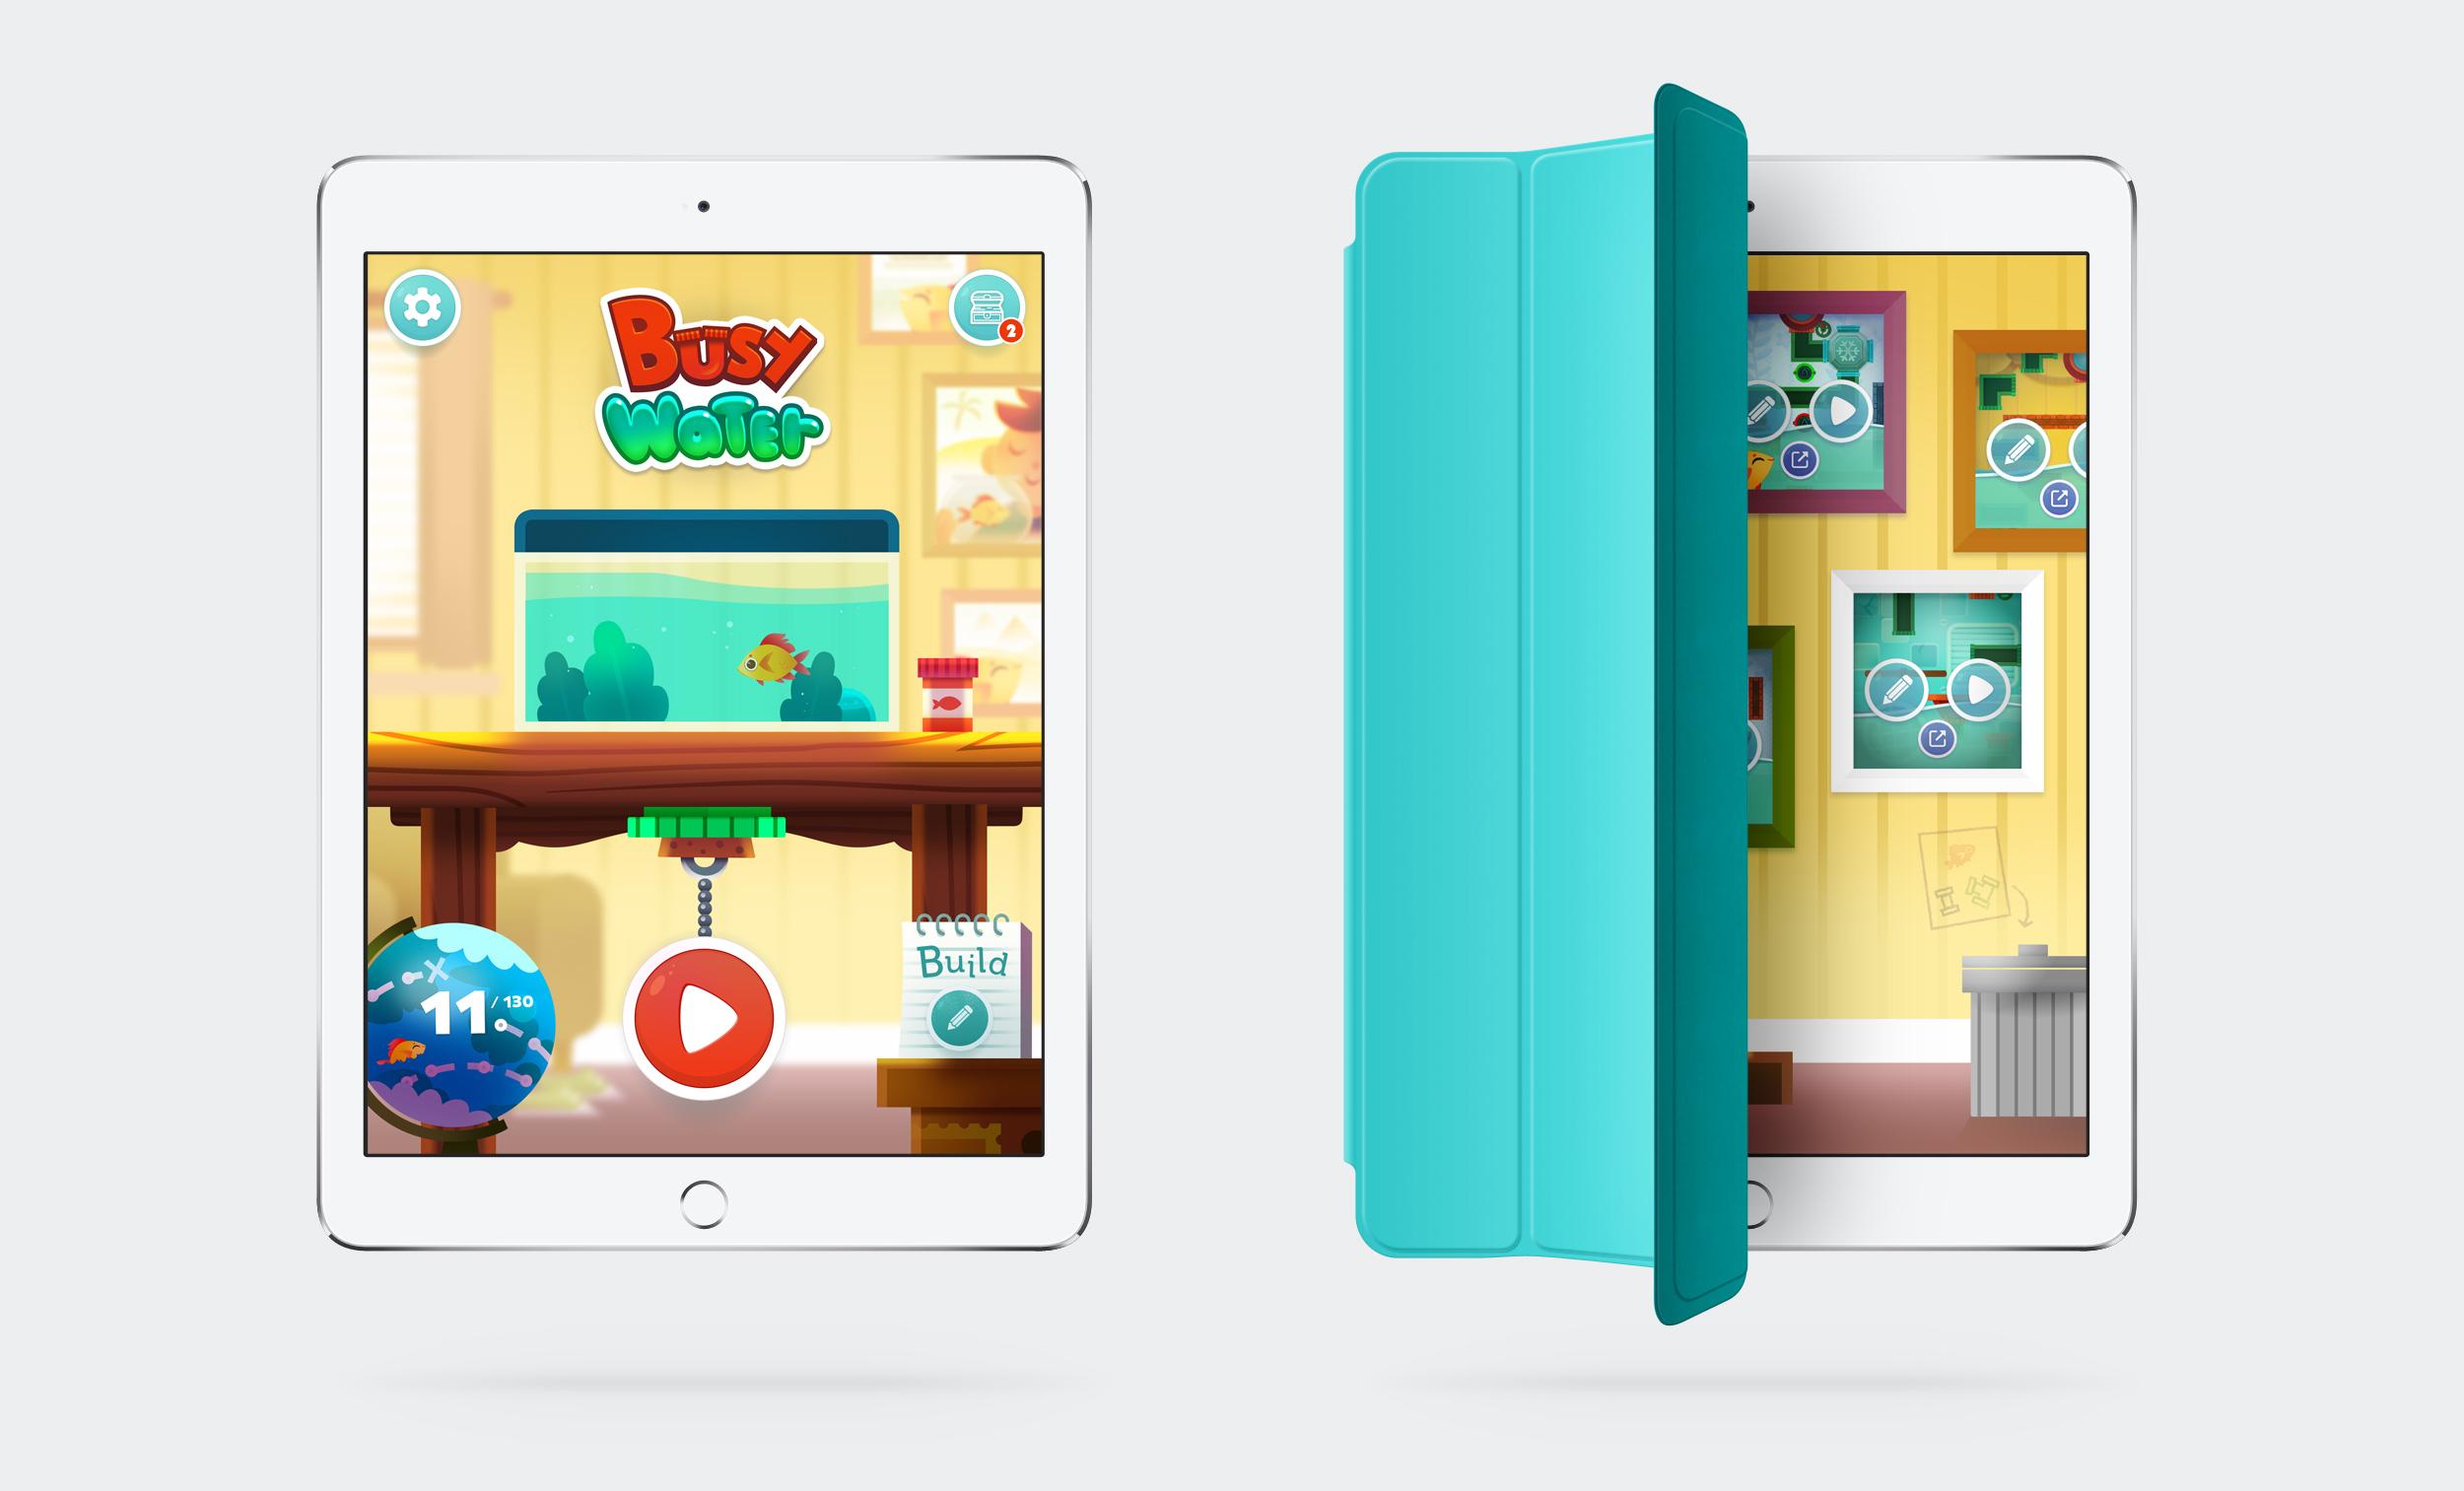 Busy Water app ipad